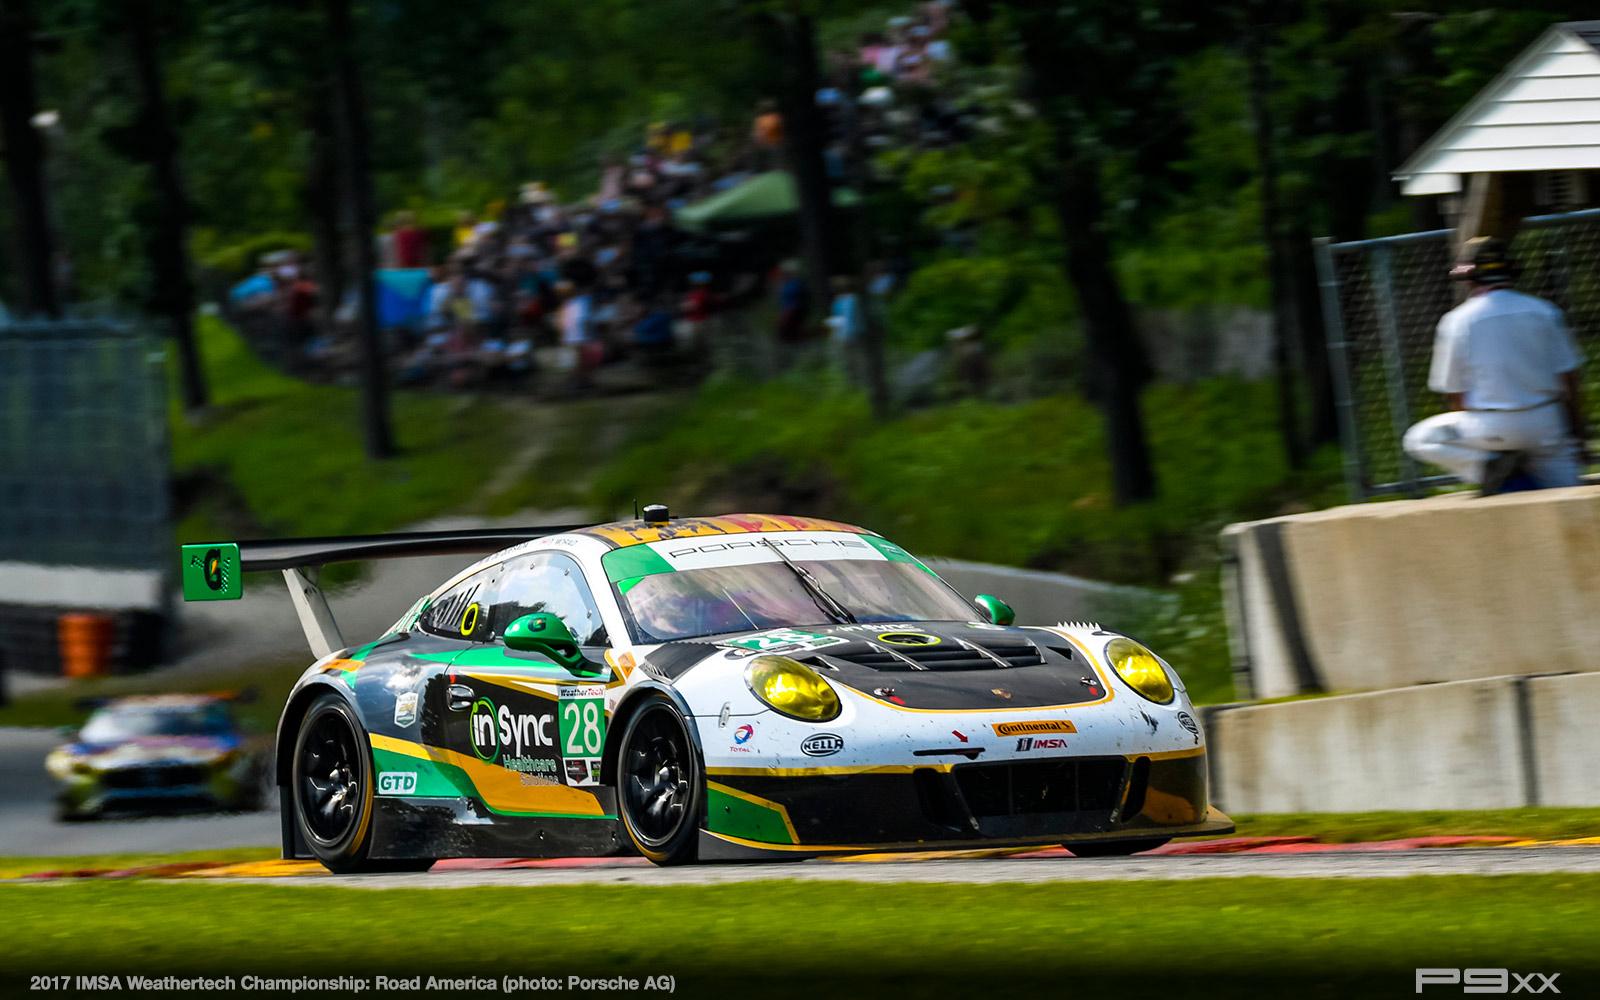 2017-IMSA-Weathertech-Road-America-Porsche-336